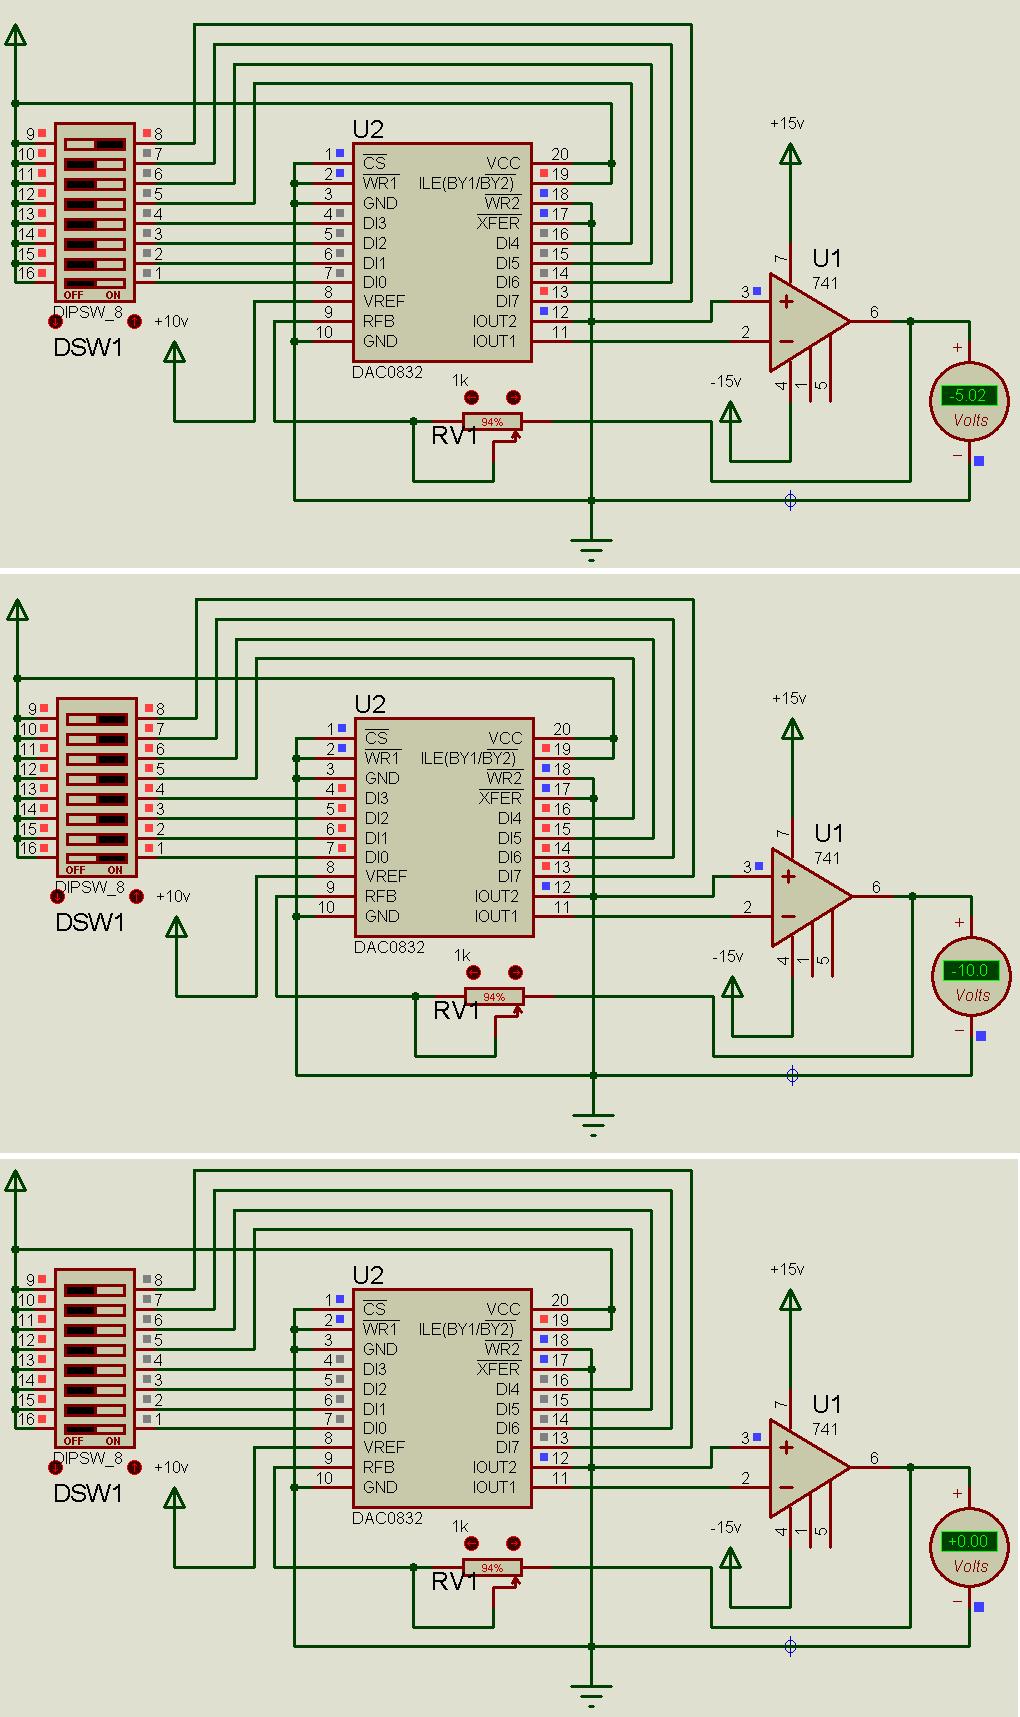 dac0832输出问题,0832的输入是接放大器ua741的,但当0832的输入为0000